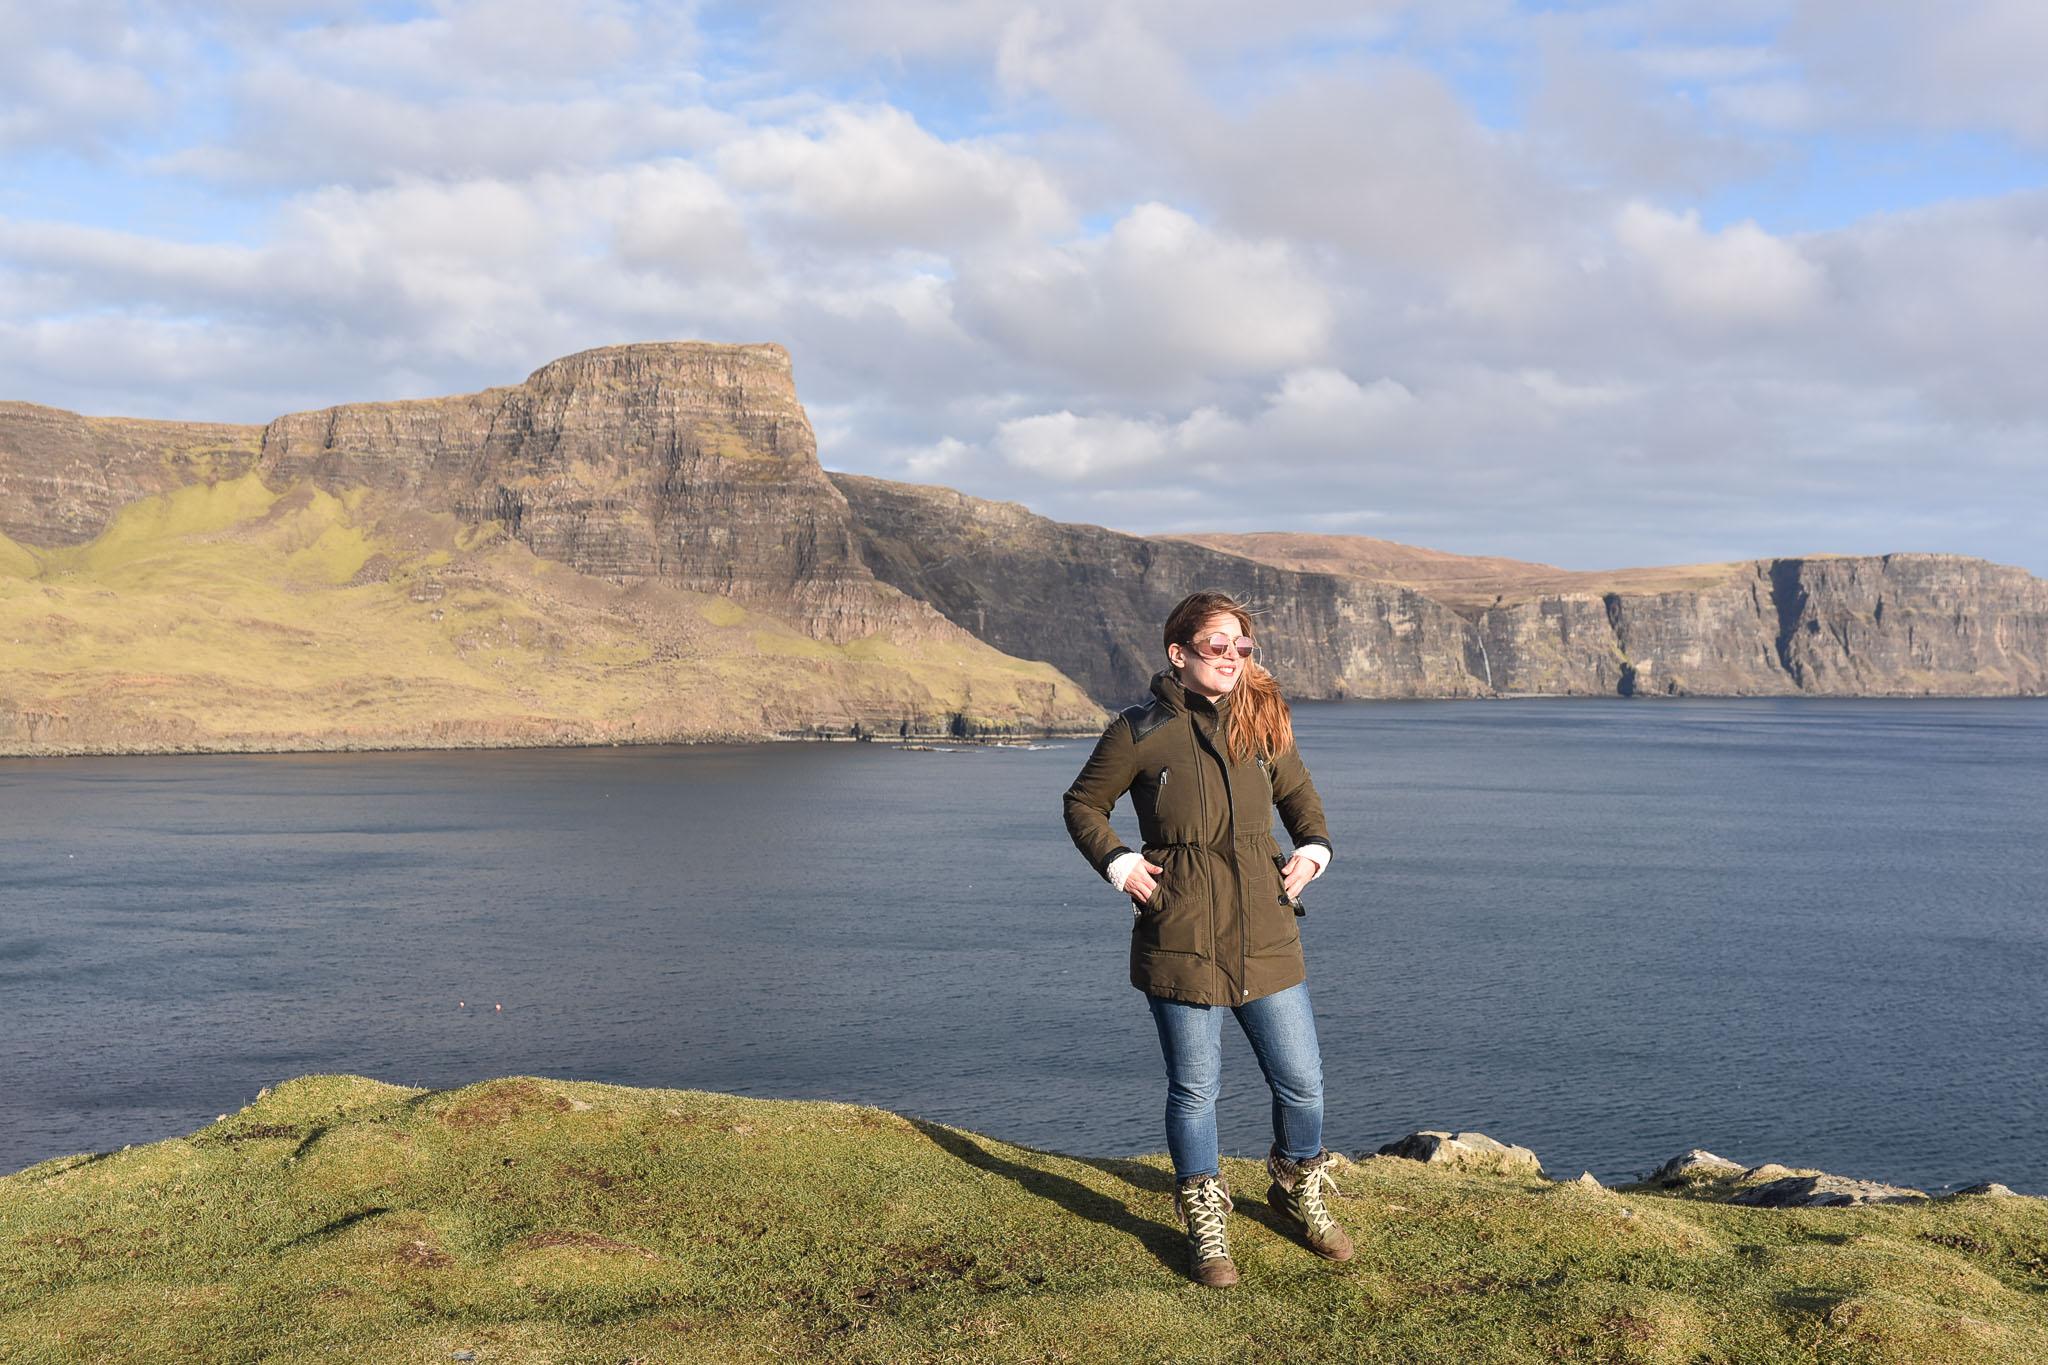 neist point paysage blogueuse voyage